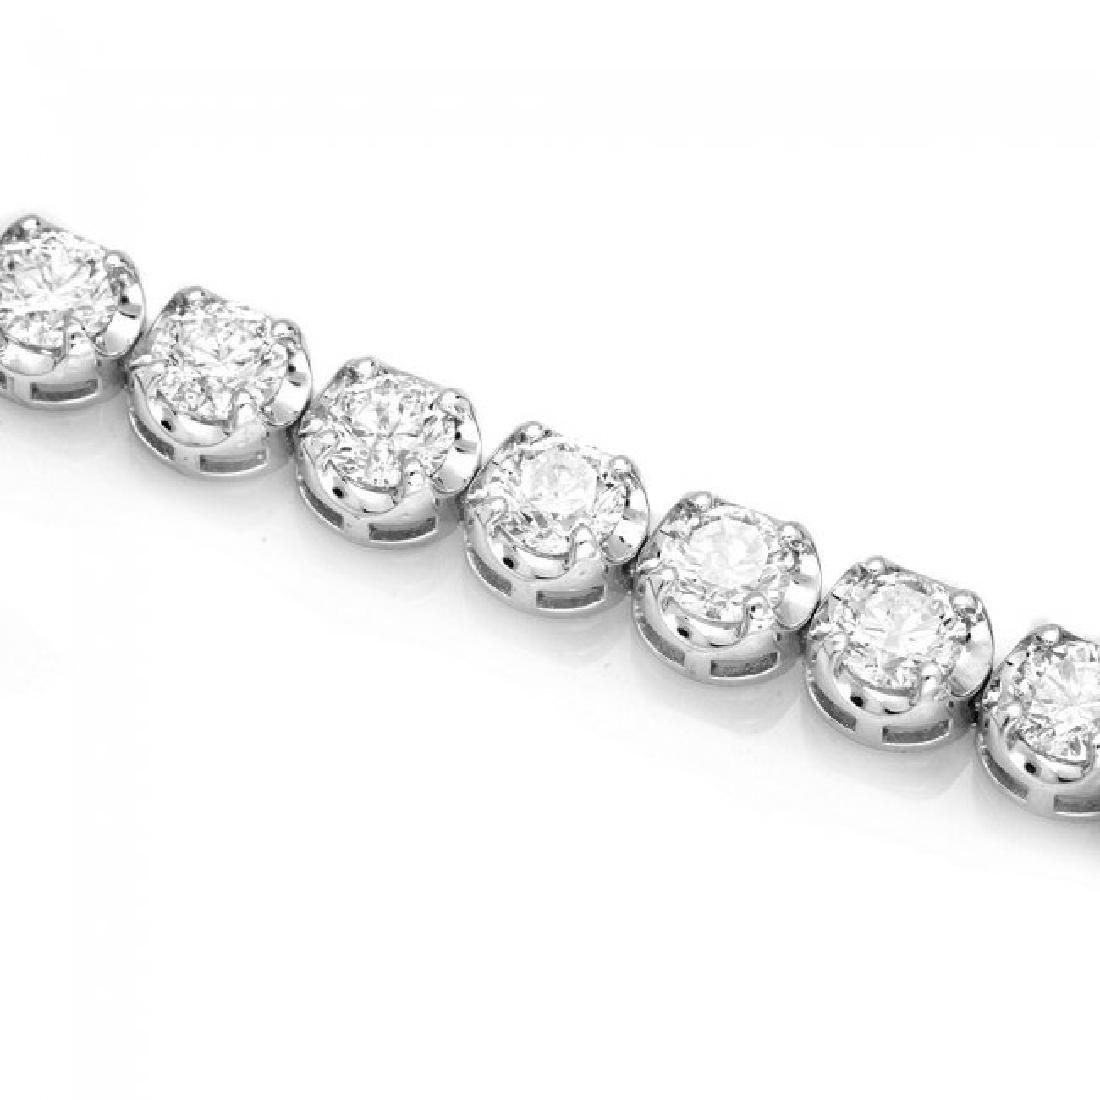 18k White Gold 10.00ct Diamond Tennis Bracelet - 3